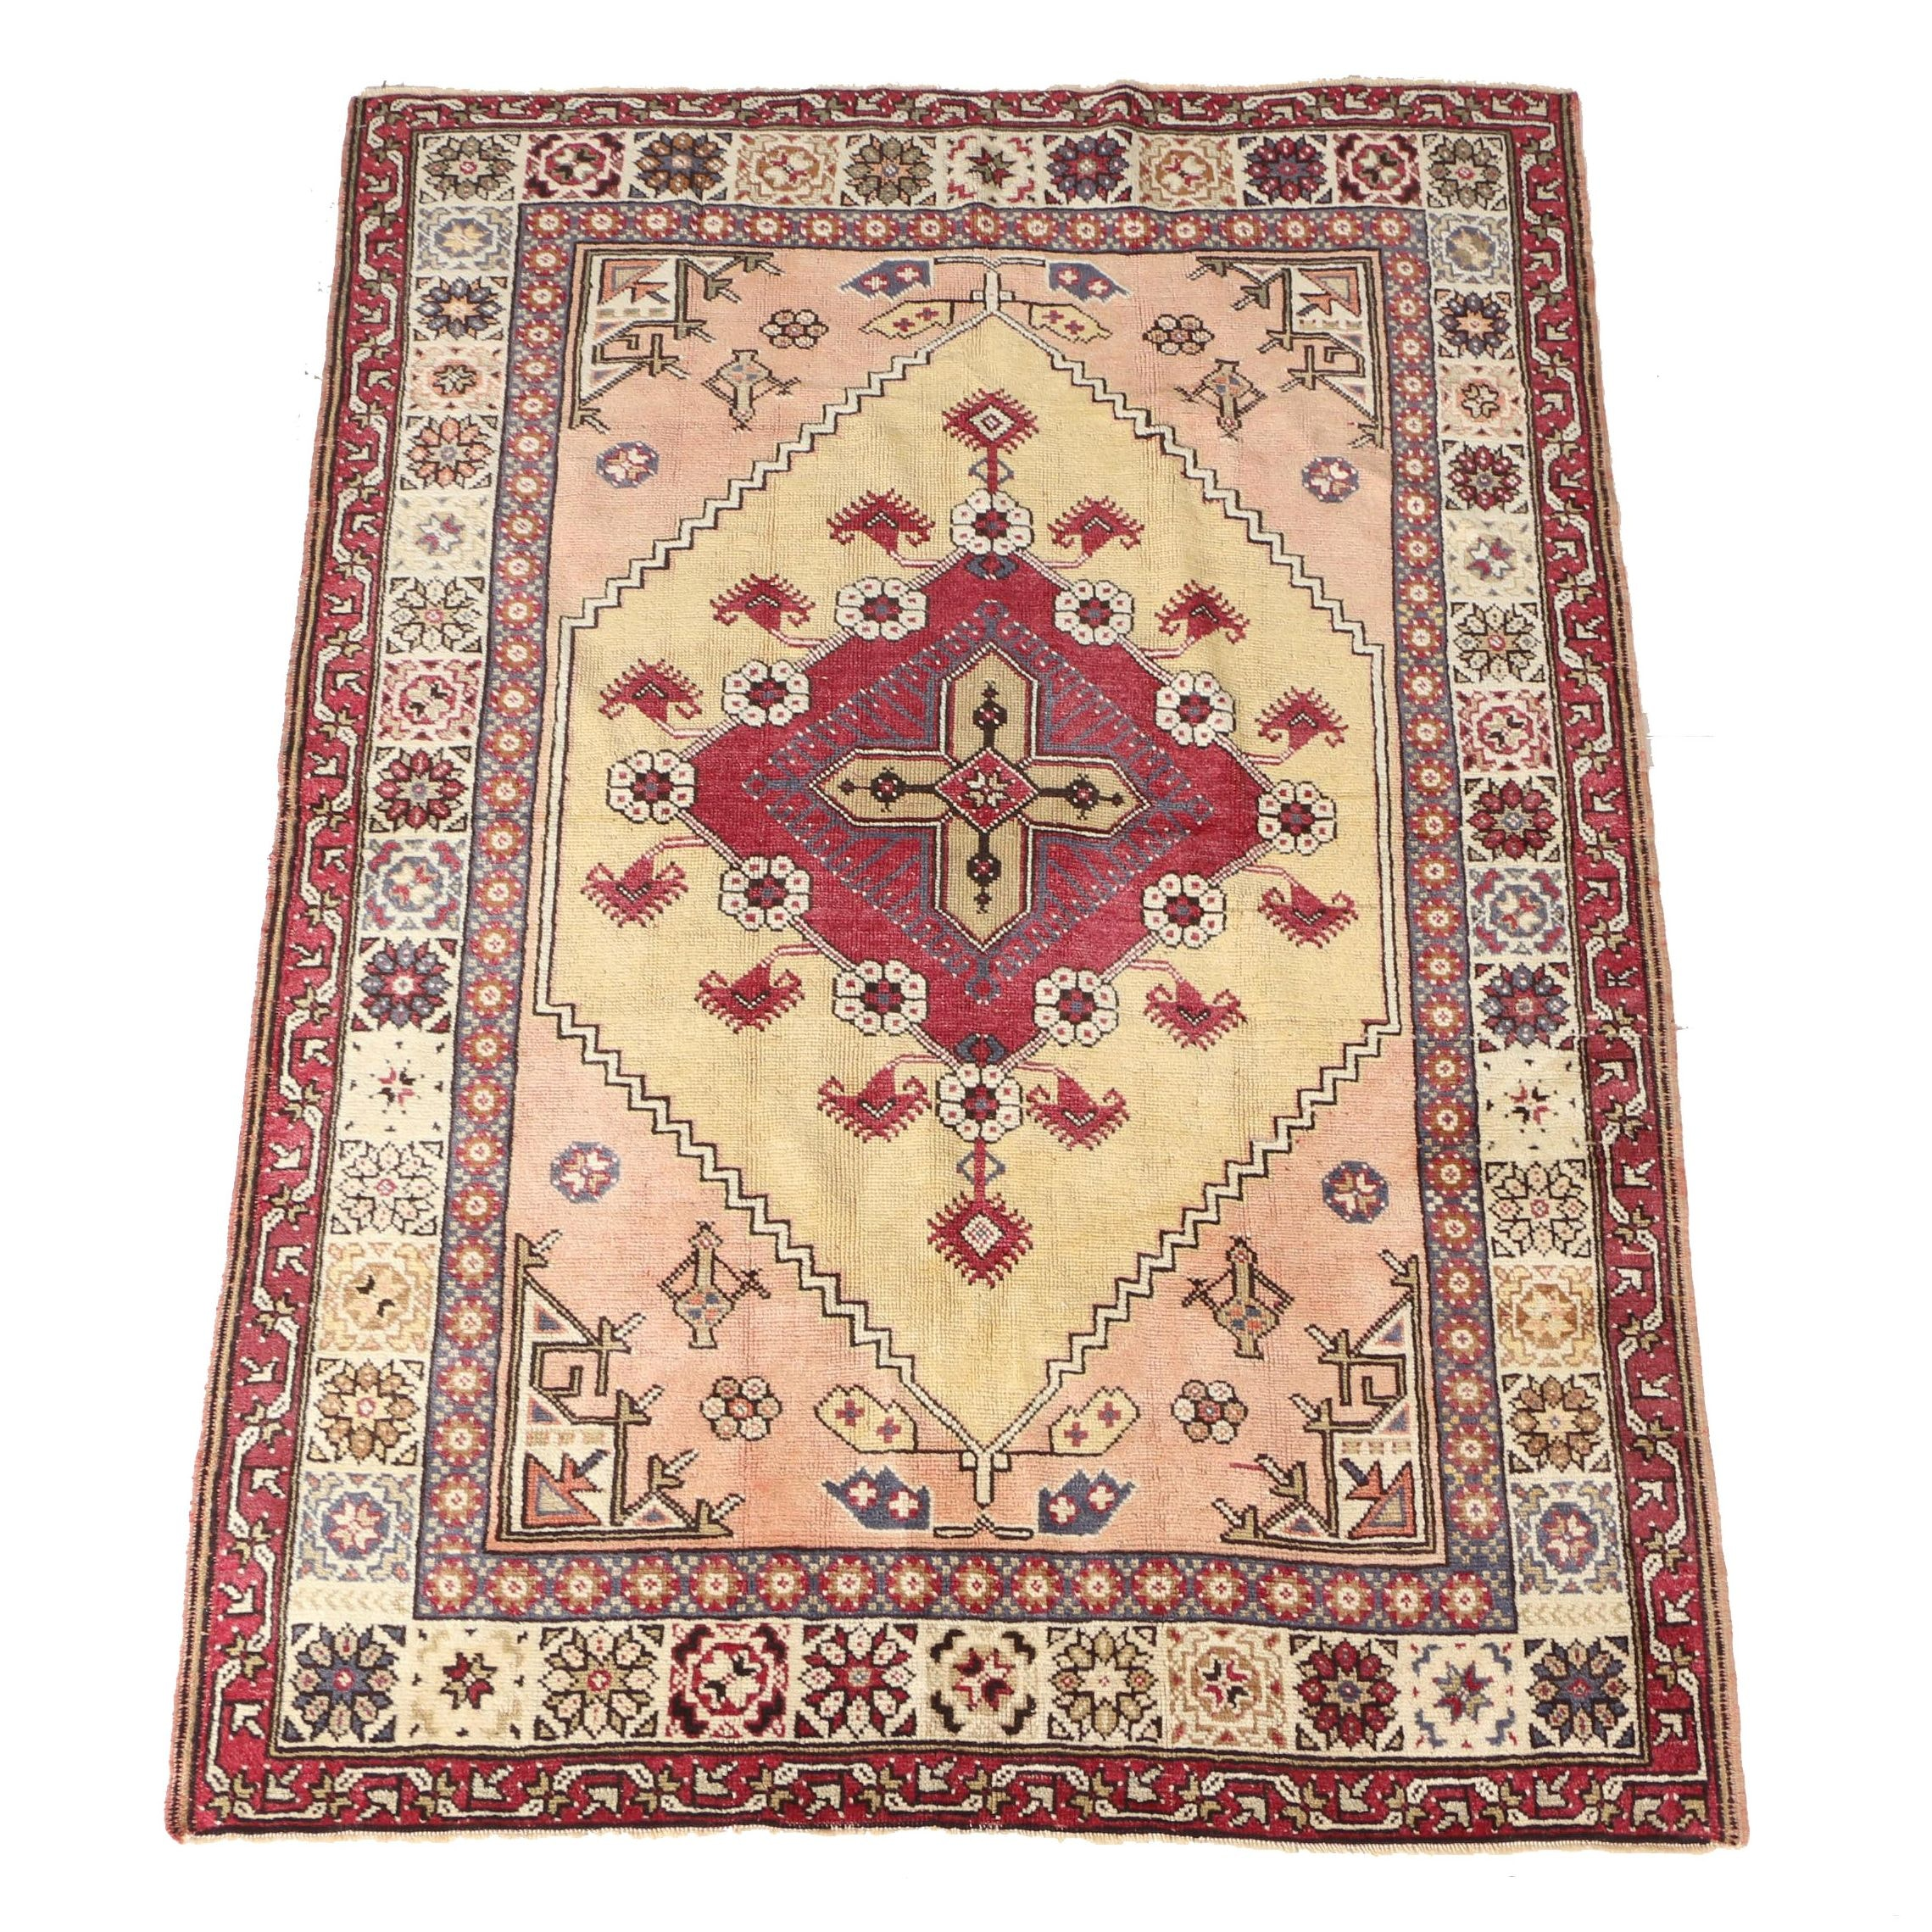 Hand Woven Turkish Wool Area Rug